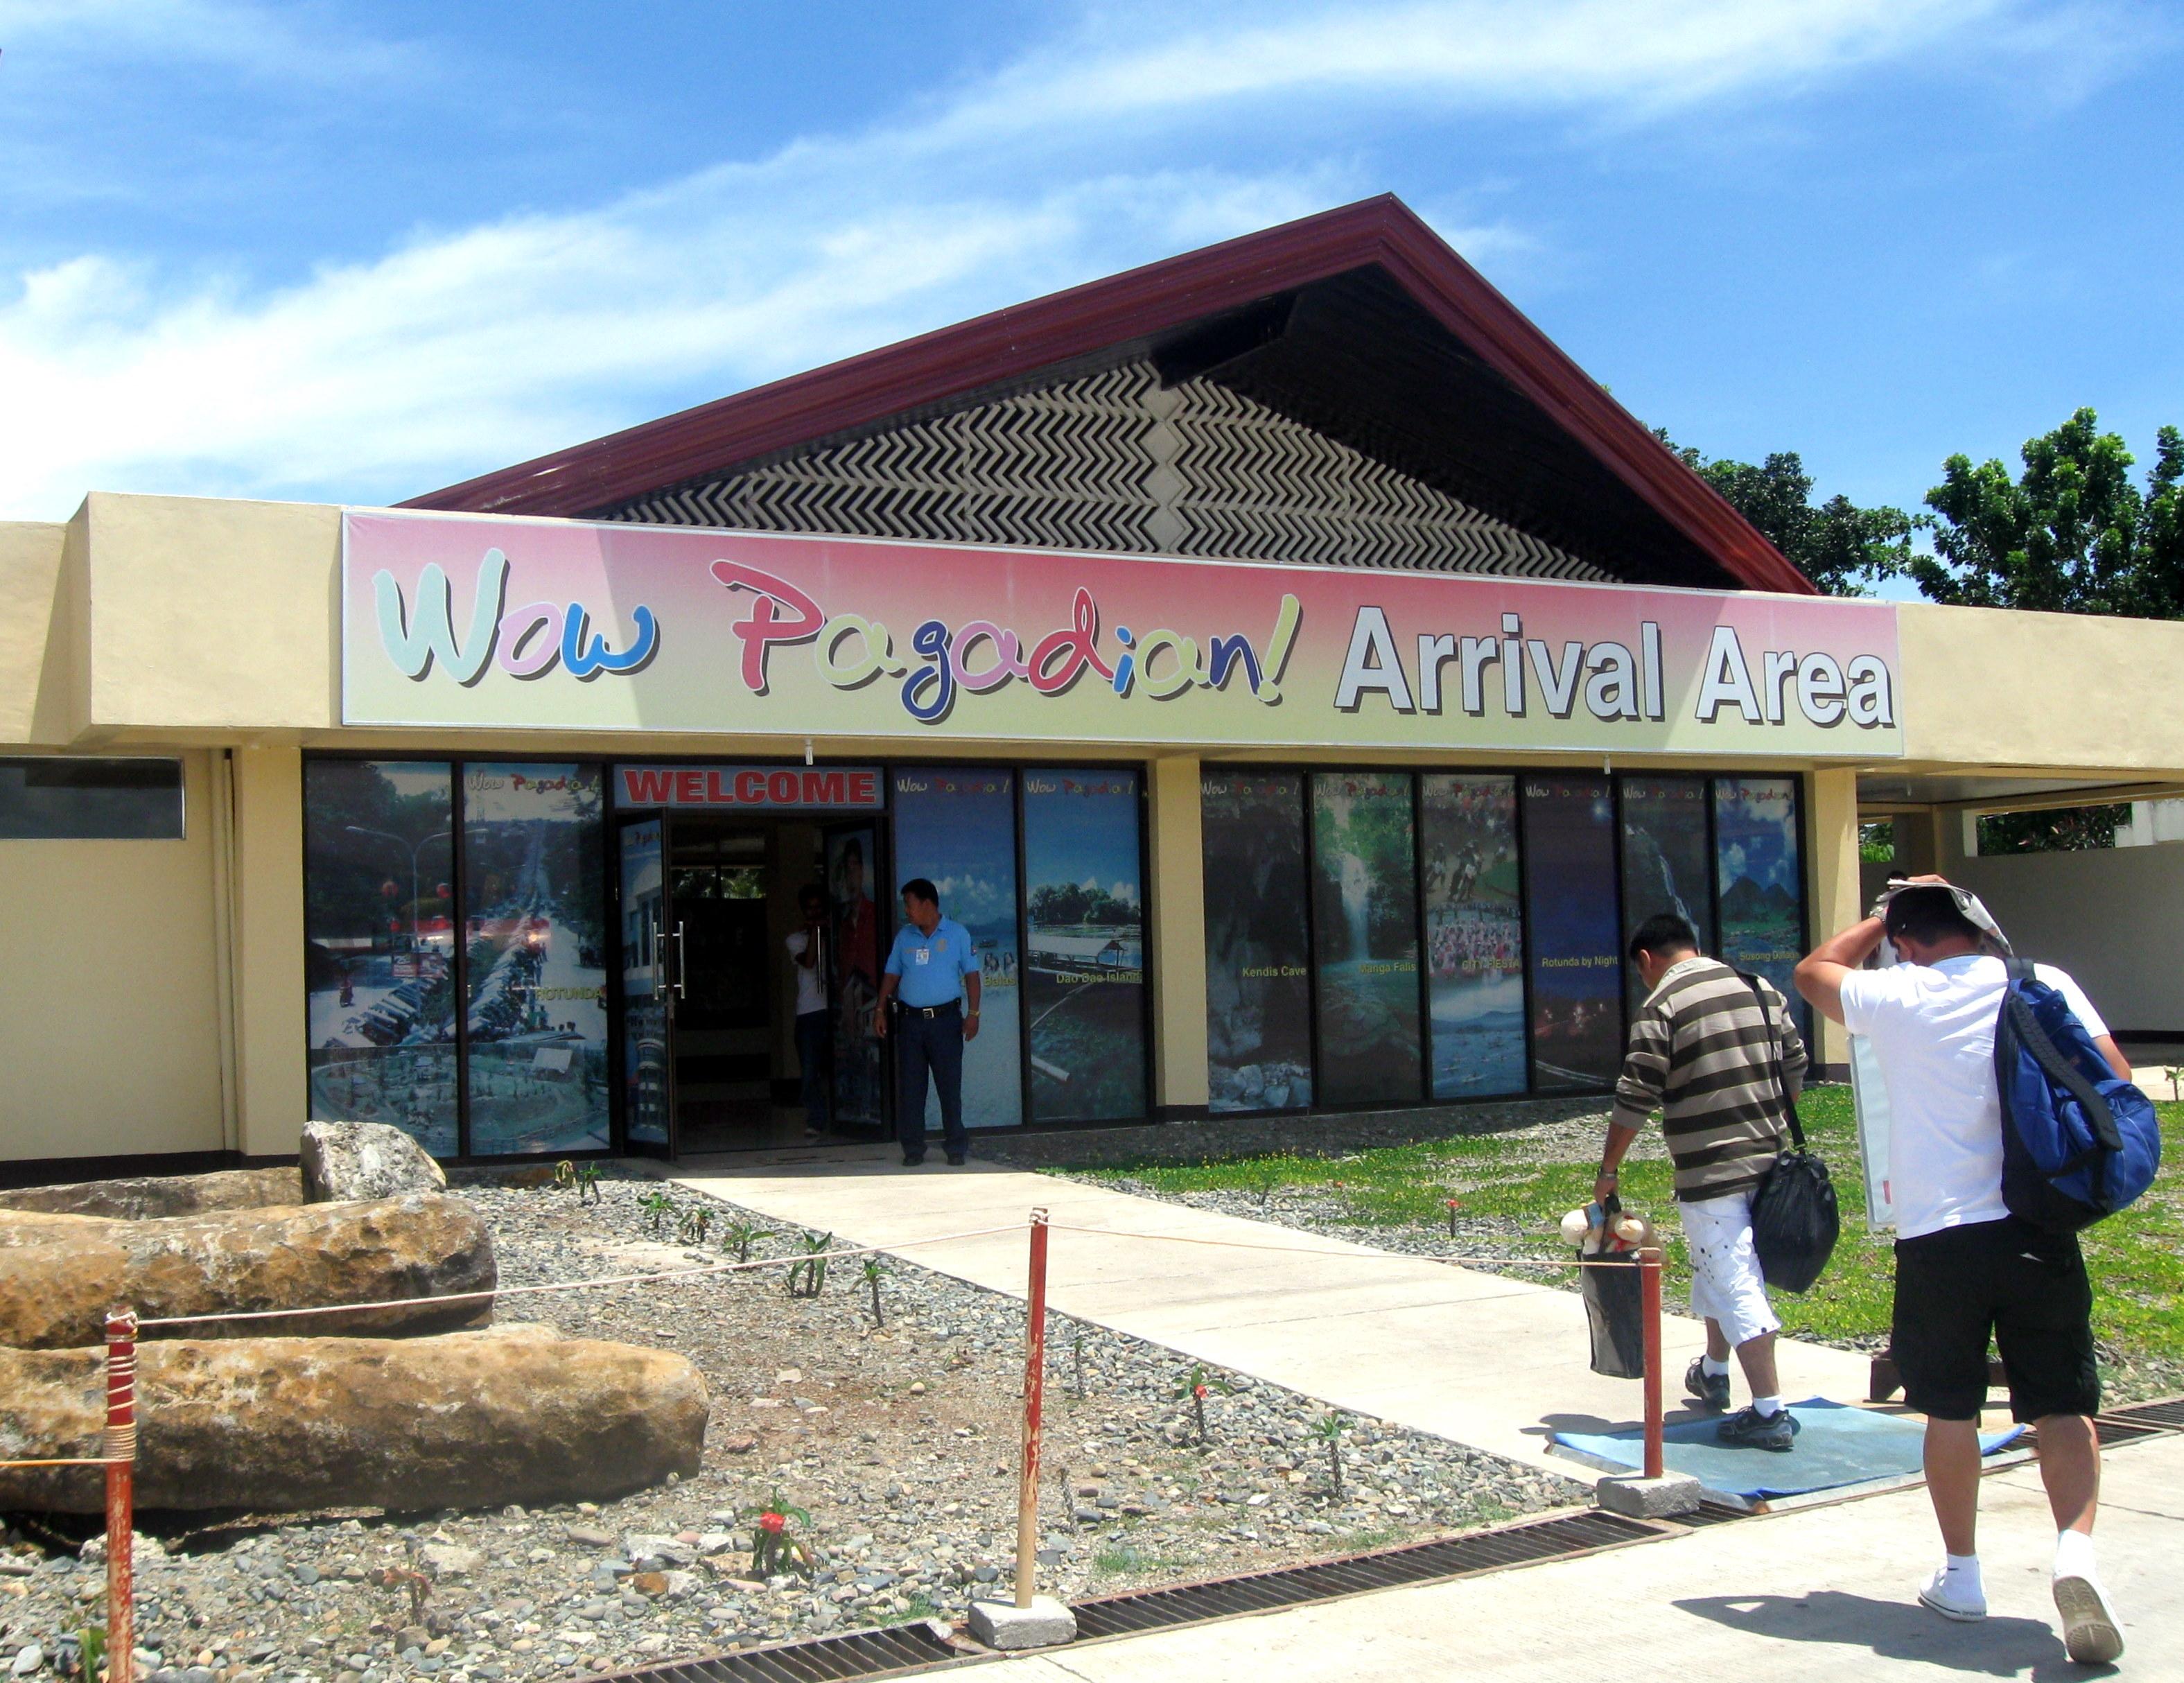 Pagadian City: An Adventurers Paradise - TriptheIslands.com